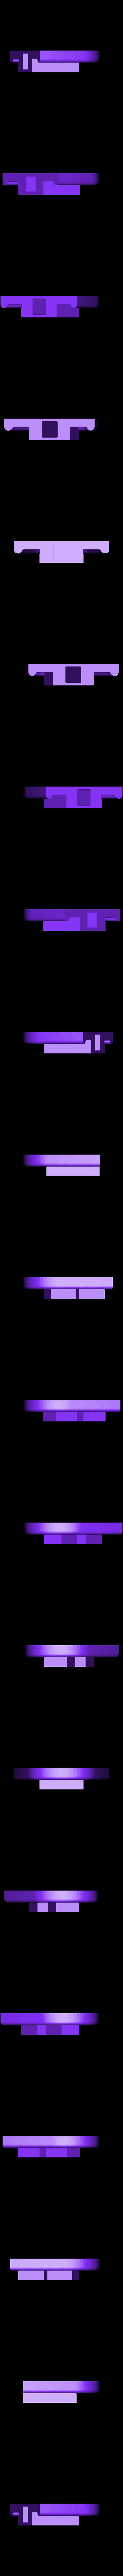 BOARD1.STL Download free STL file Pennyboard • 3D printing model, jaazasja